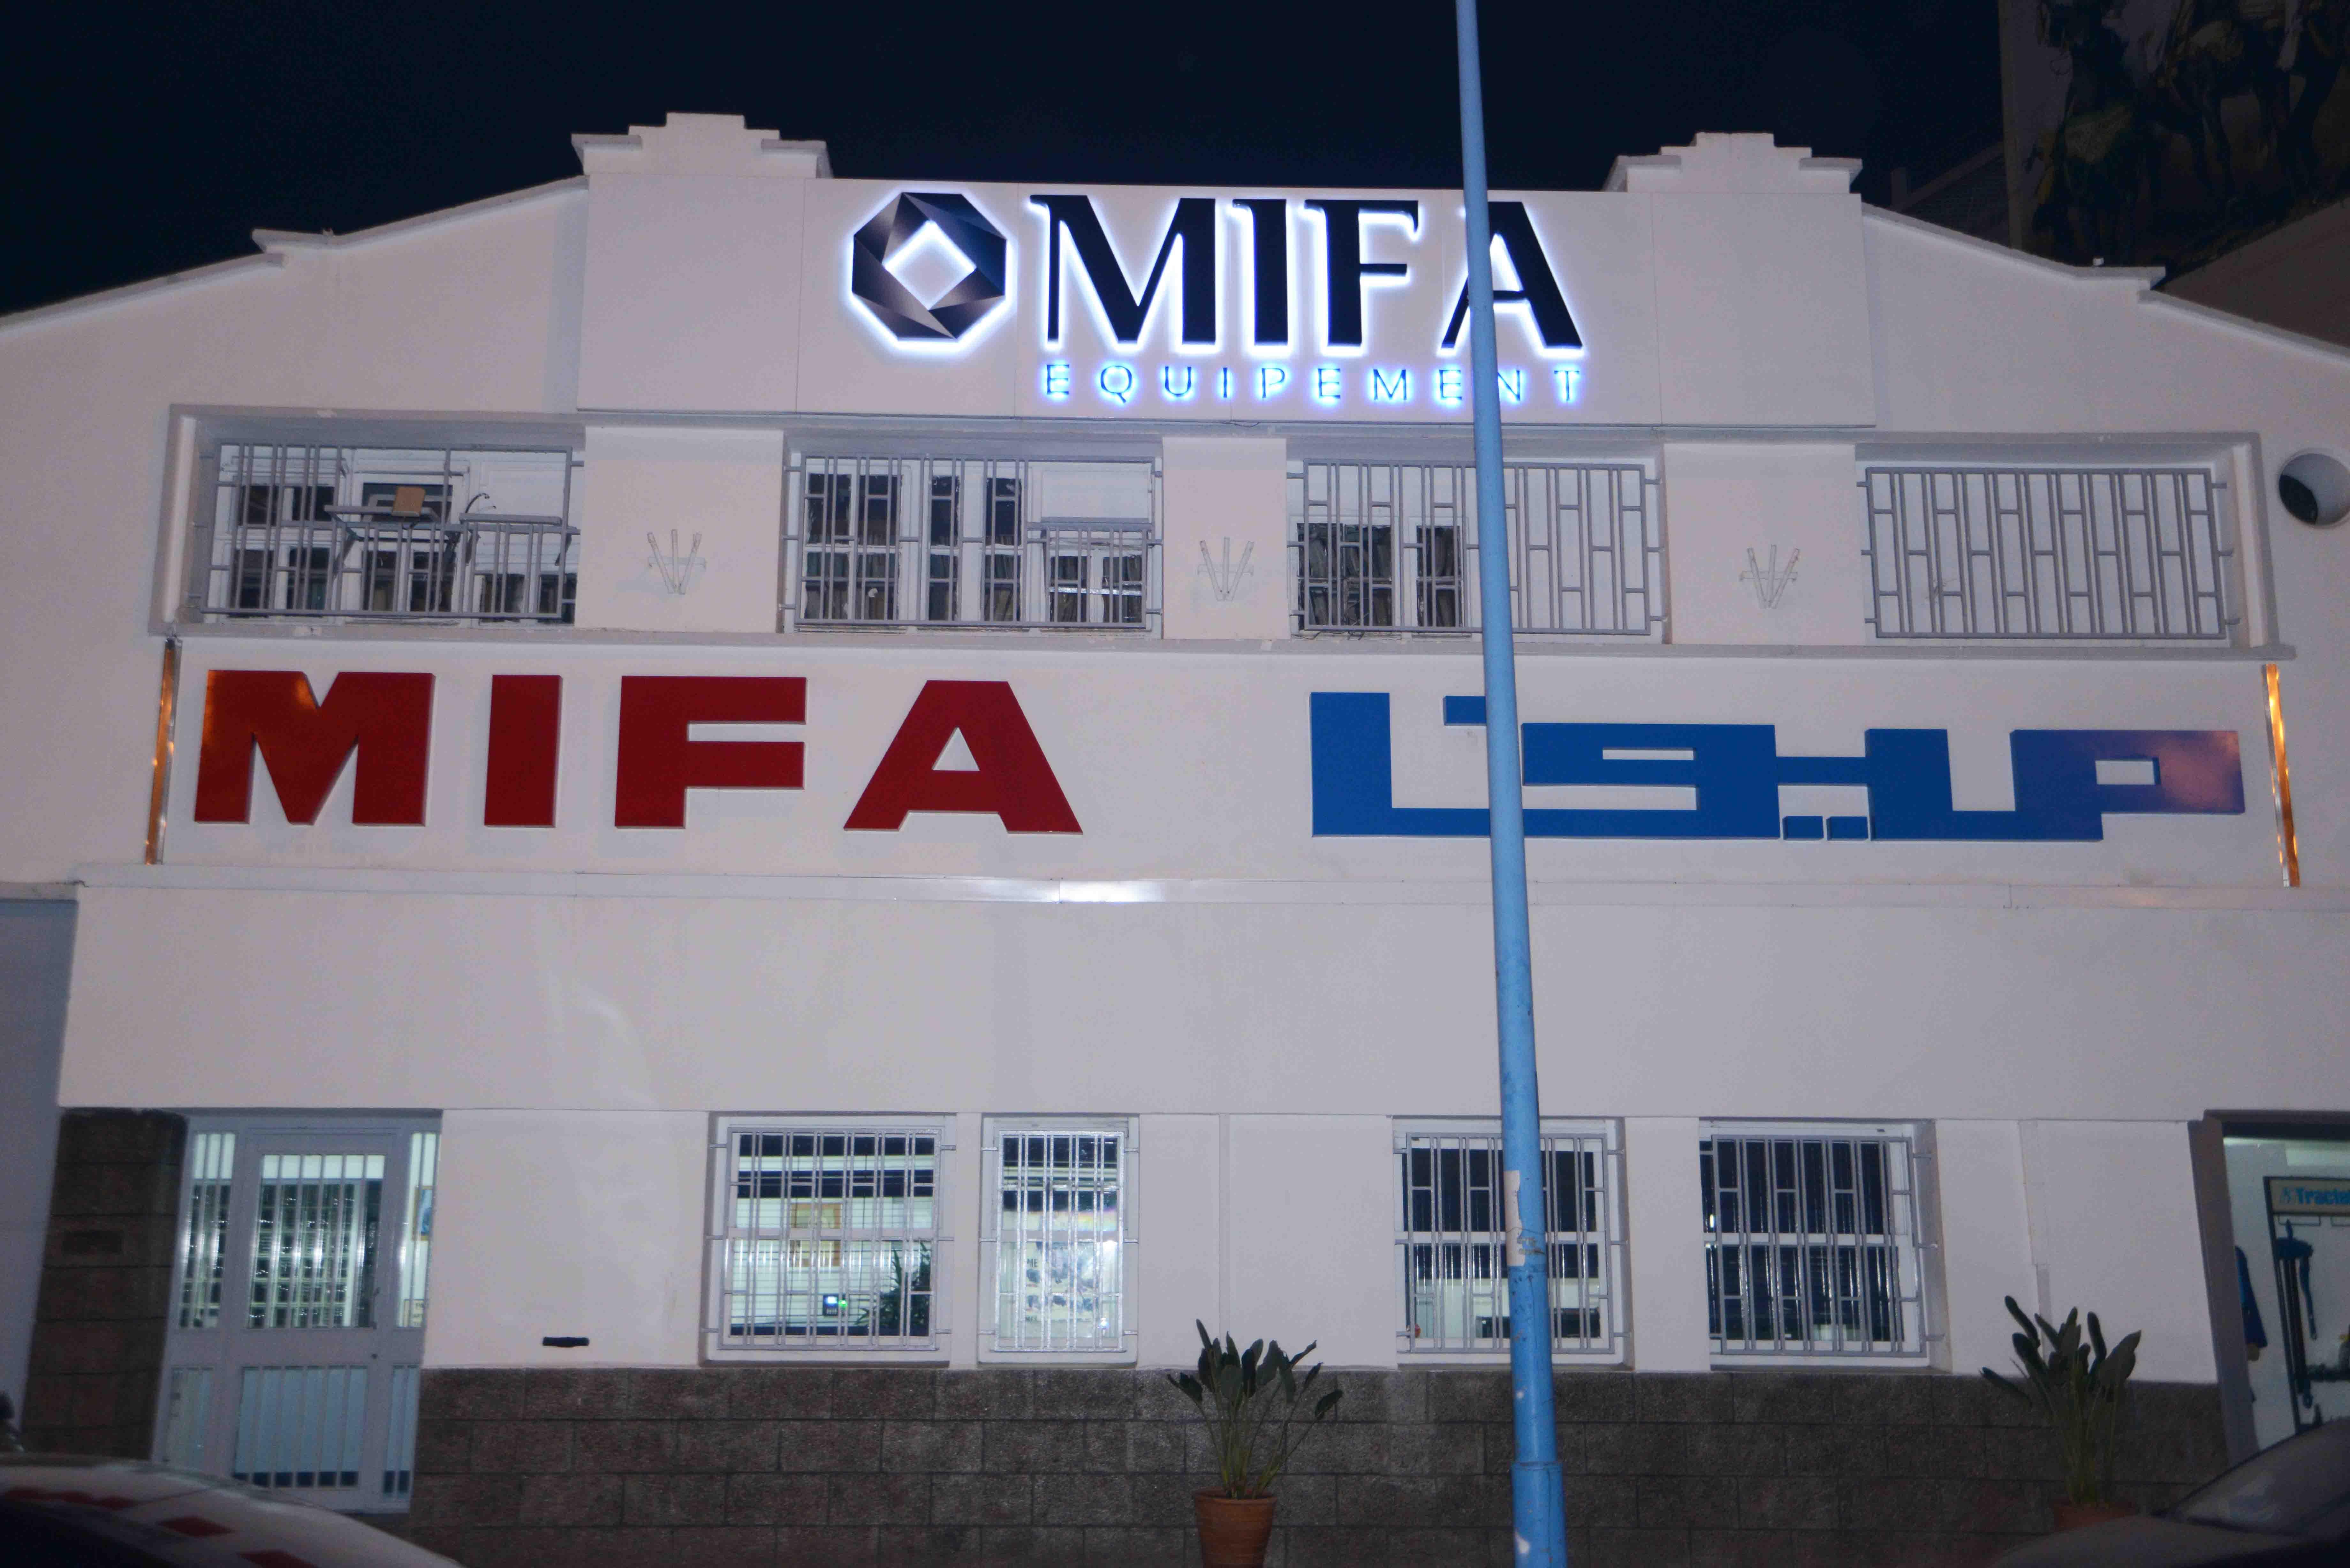 Mifa Equipement Boulevard Ibn Tachfine casablanca